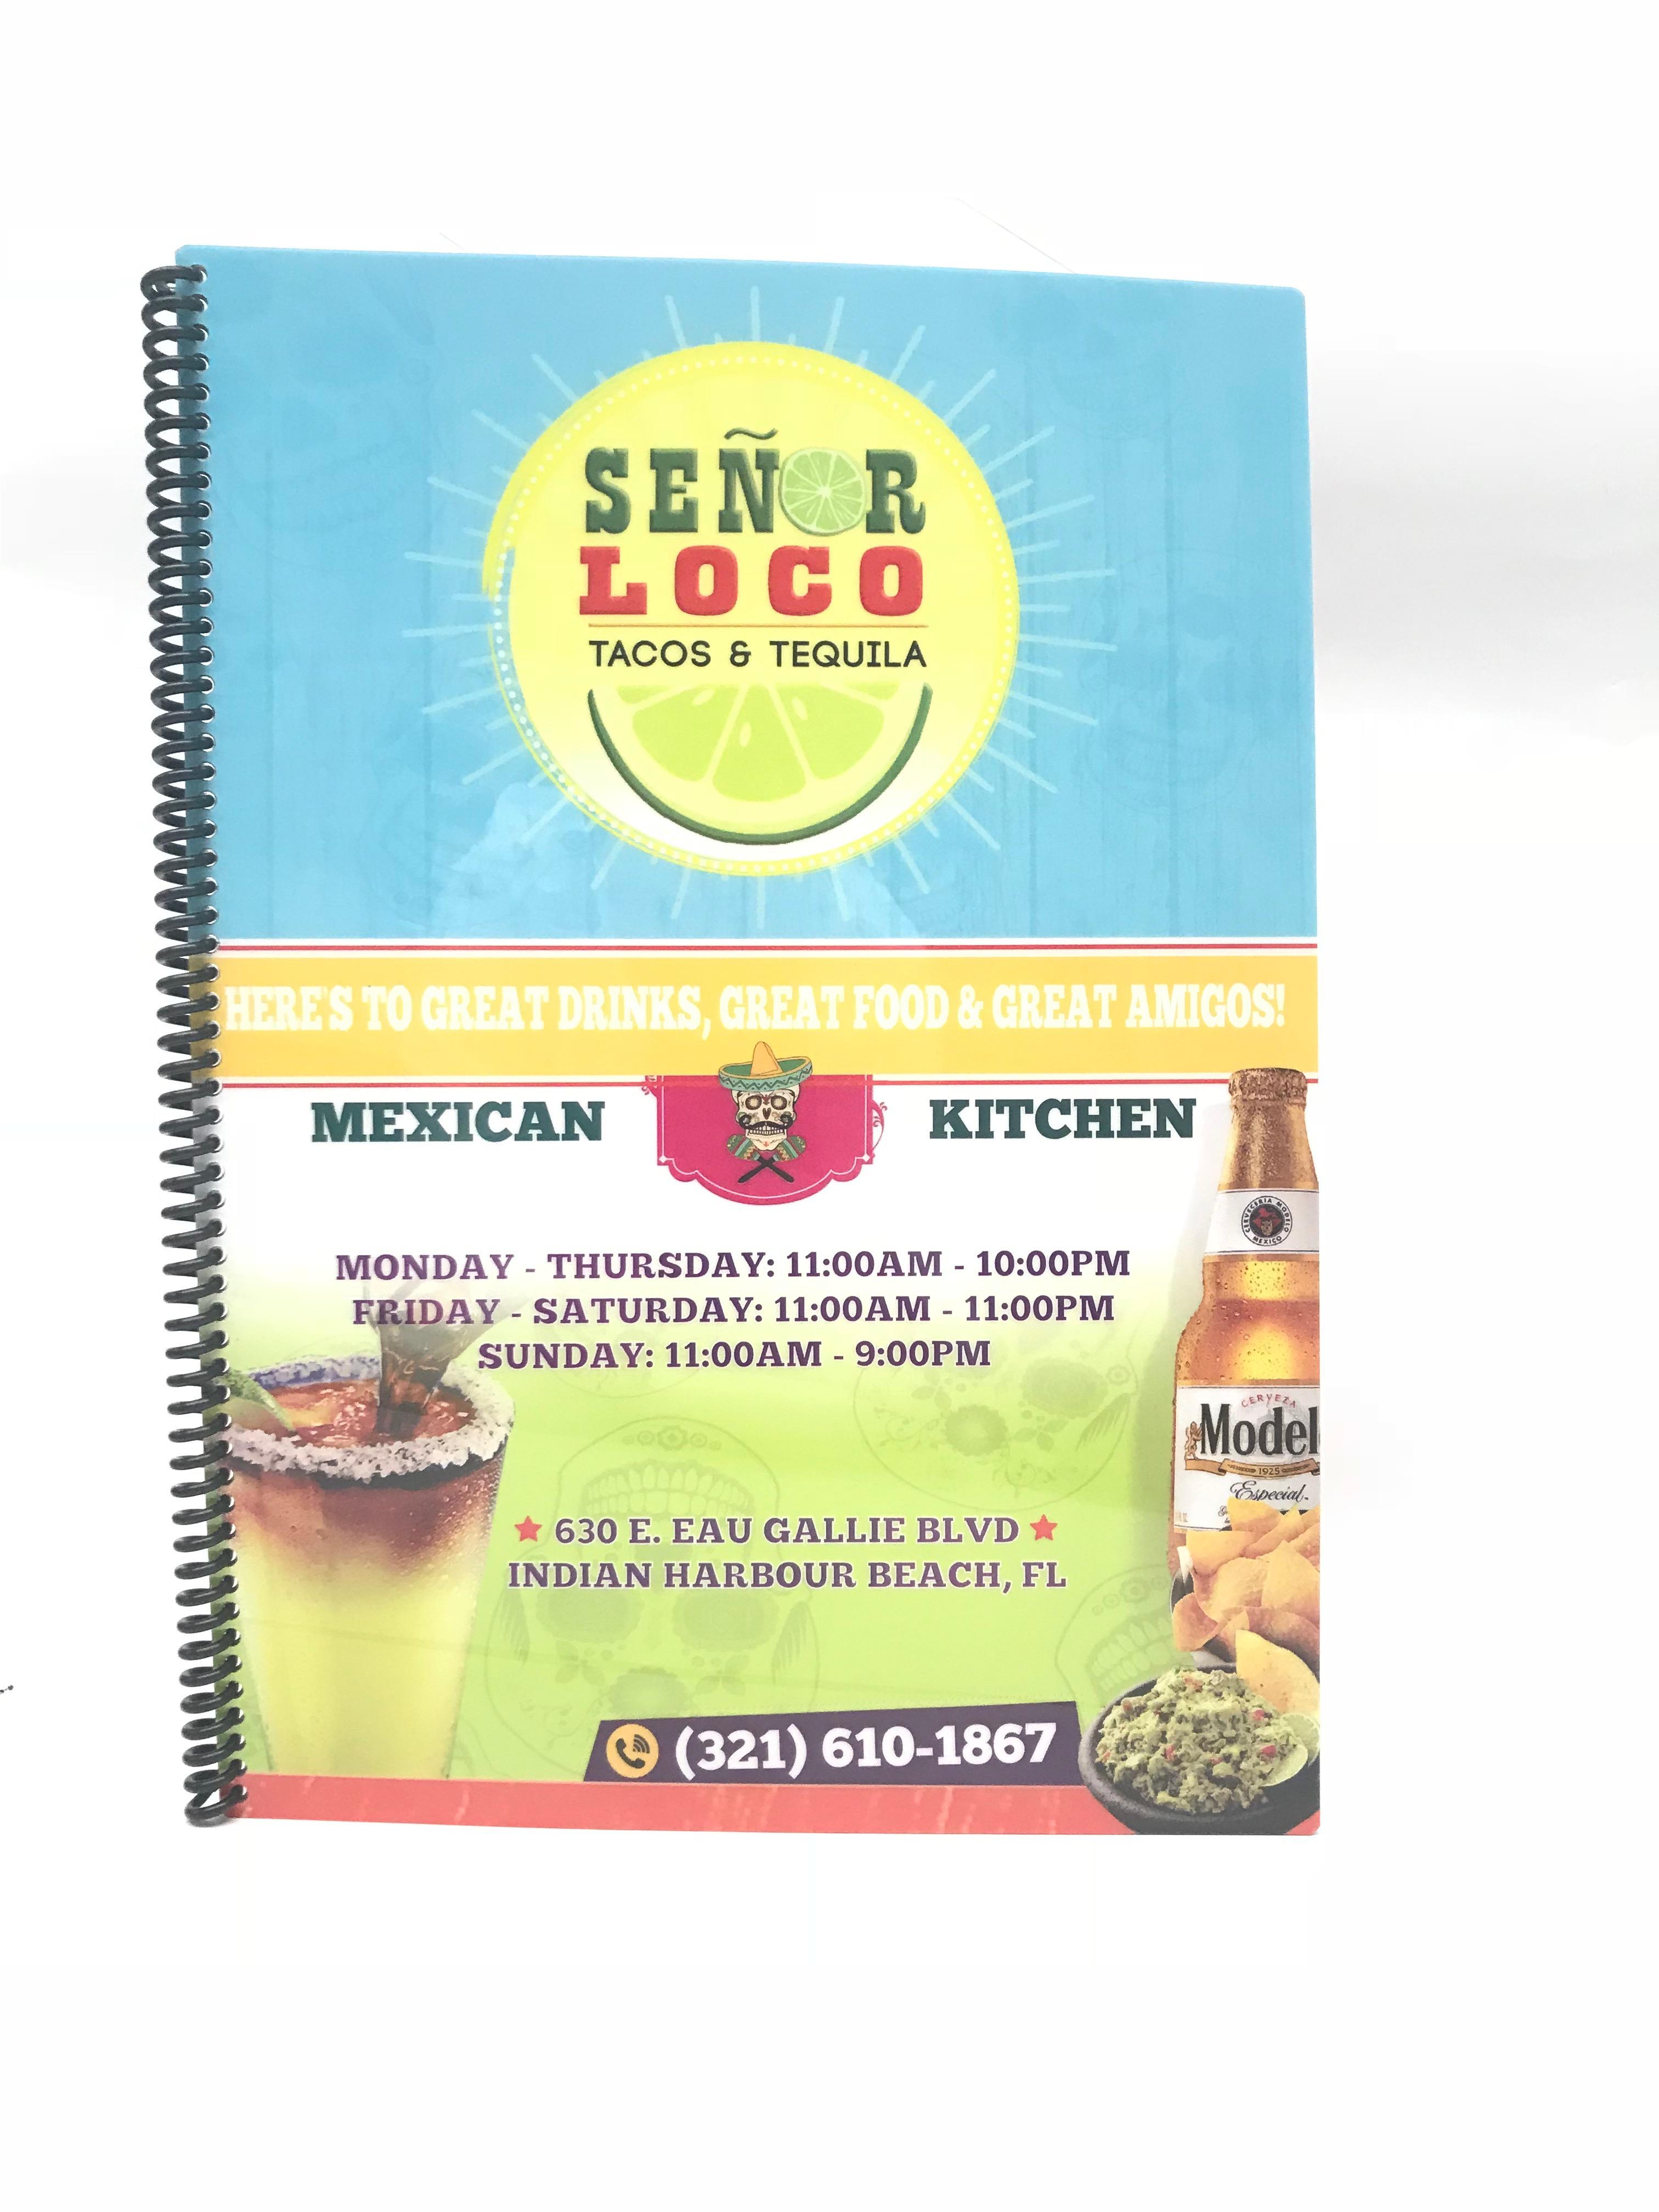 senor loco